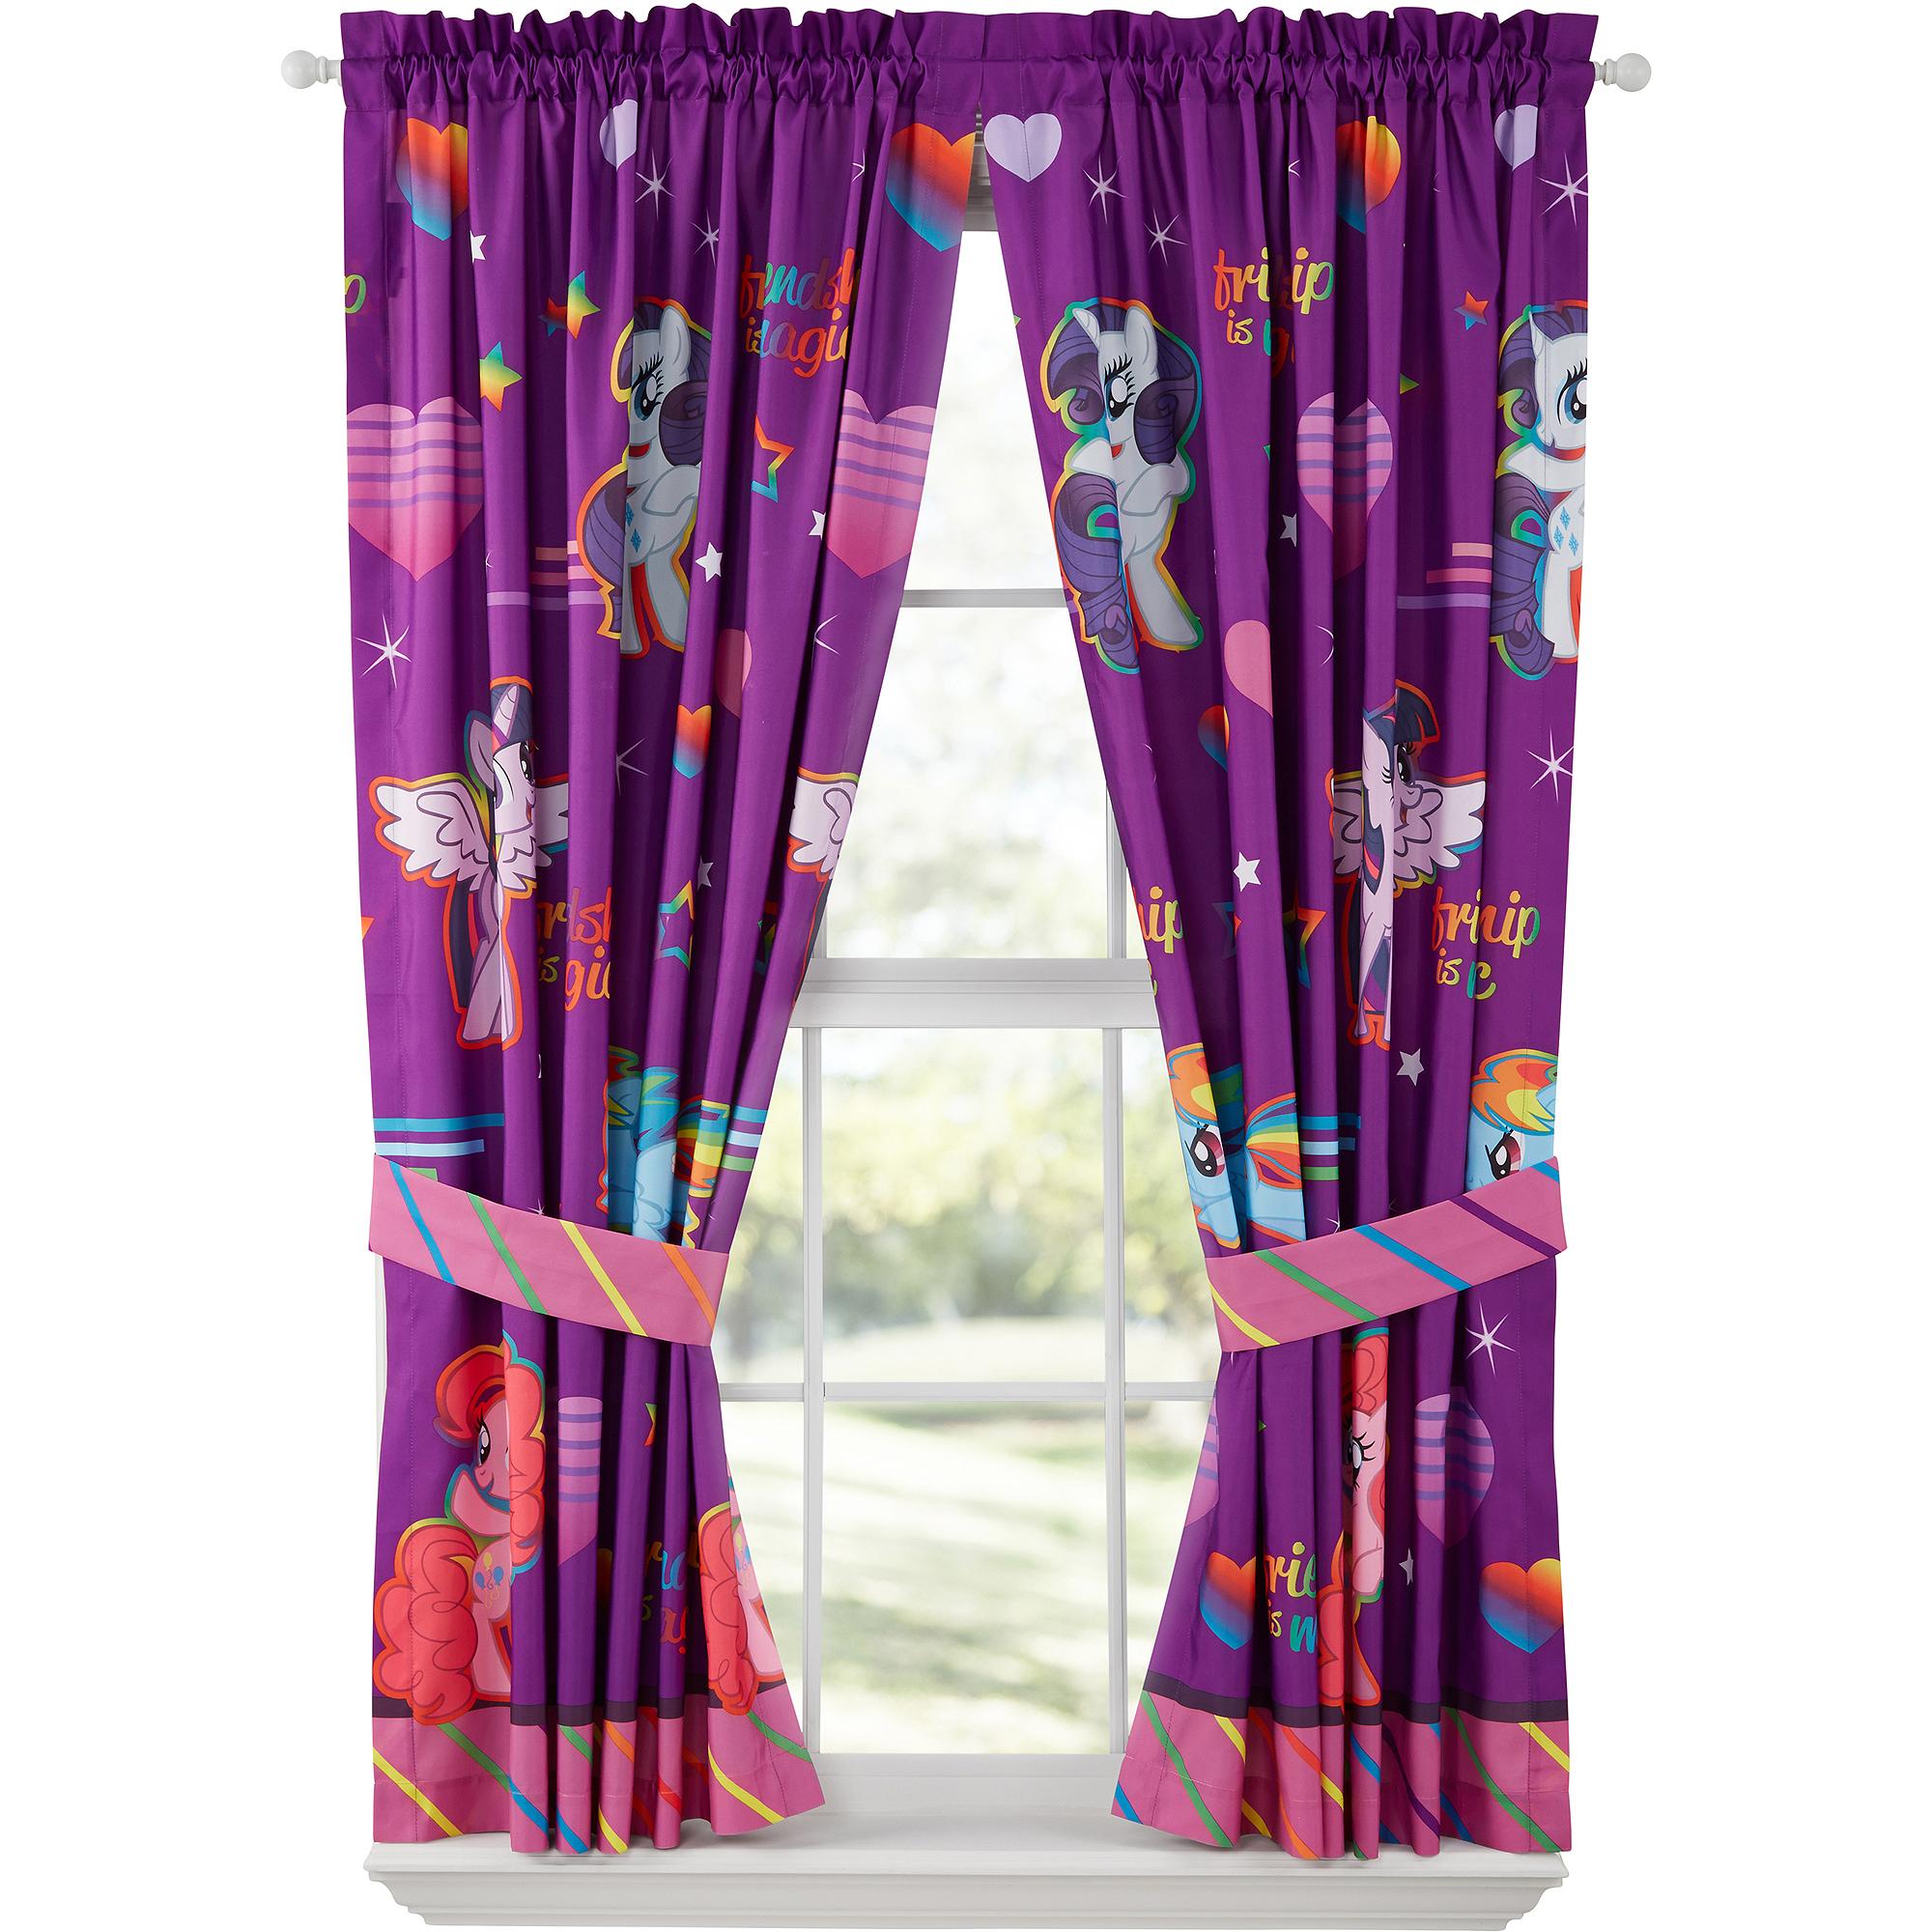 Eclipse Thermalayer Curtains | Kohls Drapes | Grommet Drapes